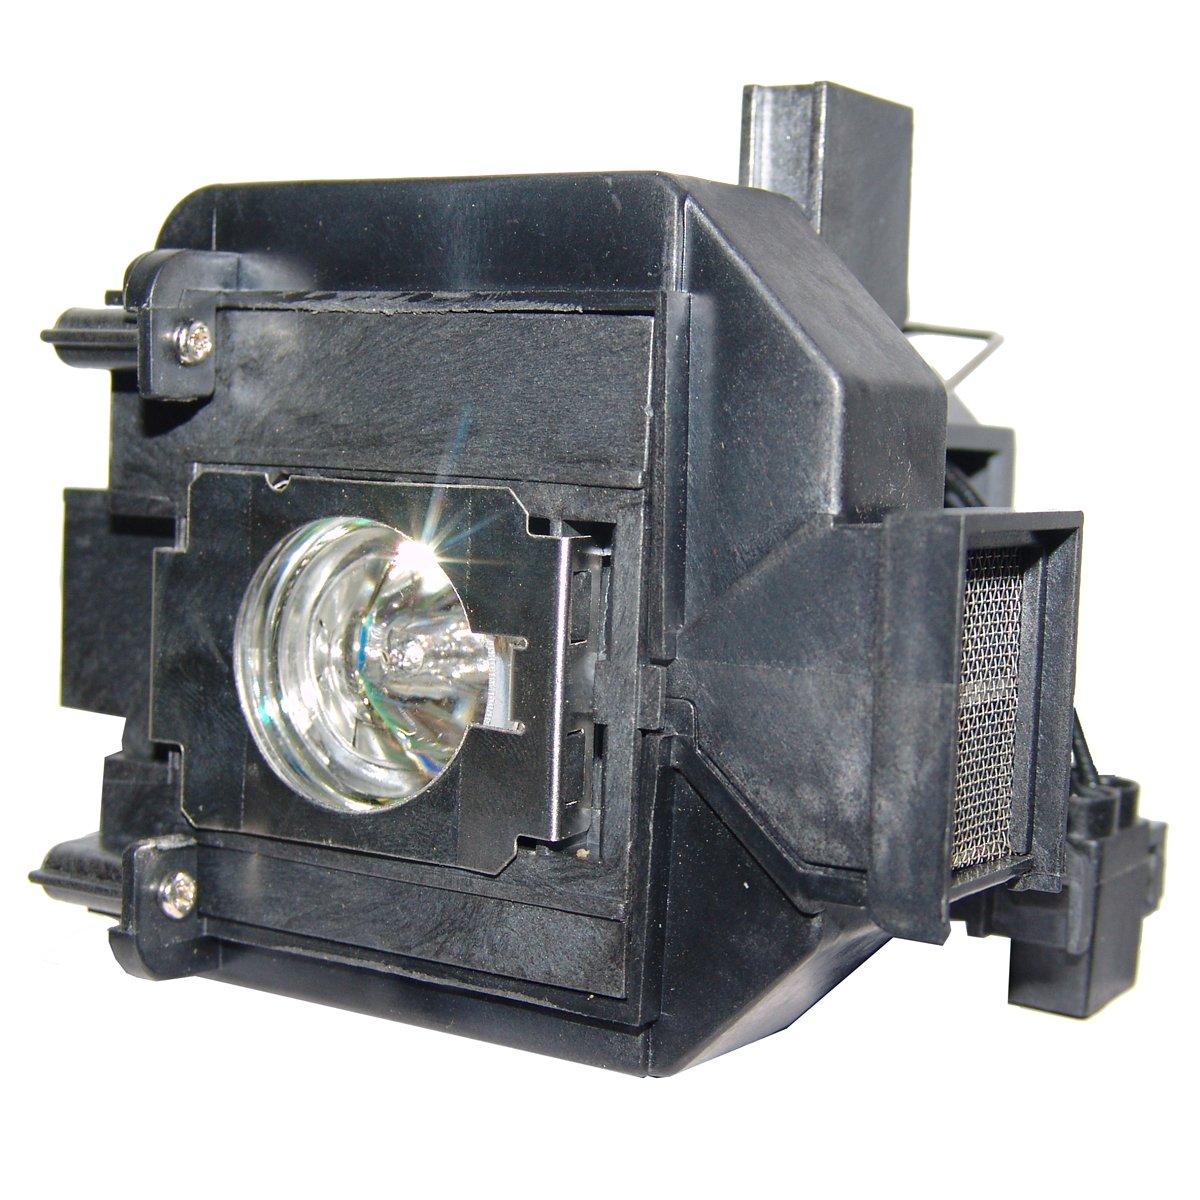 Lutema プロジェクター交換用ランプ ハウジング/電球付き Epson PowerLite Home Cinema 5020Ube用 Economy B07KTKXJFR Lamp with Housing Economy